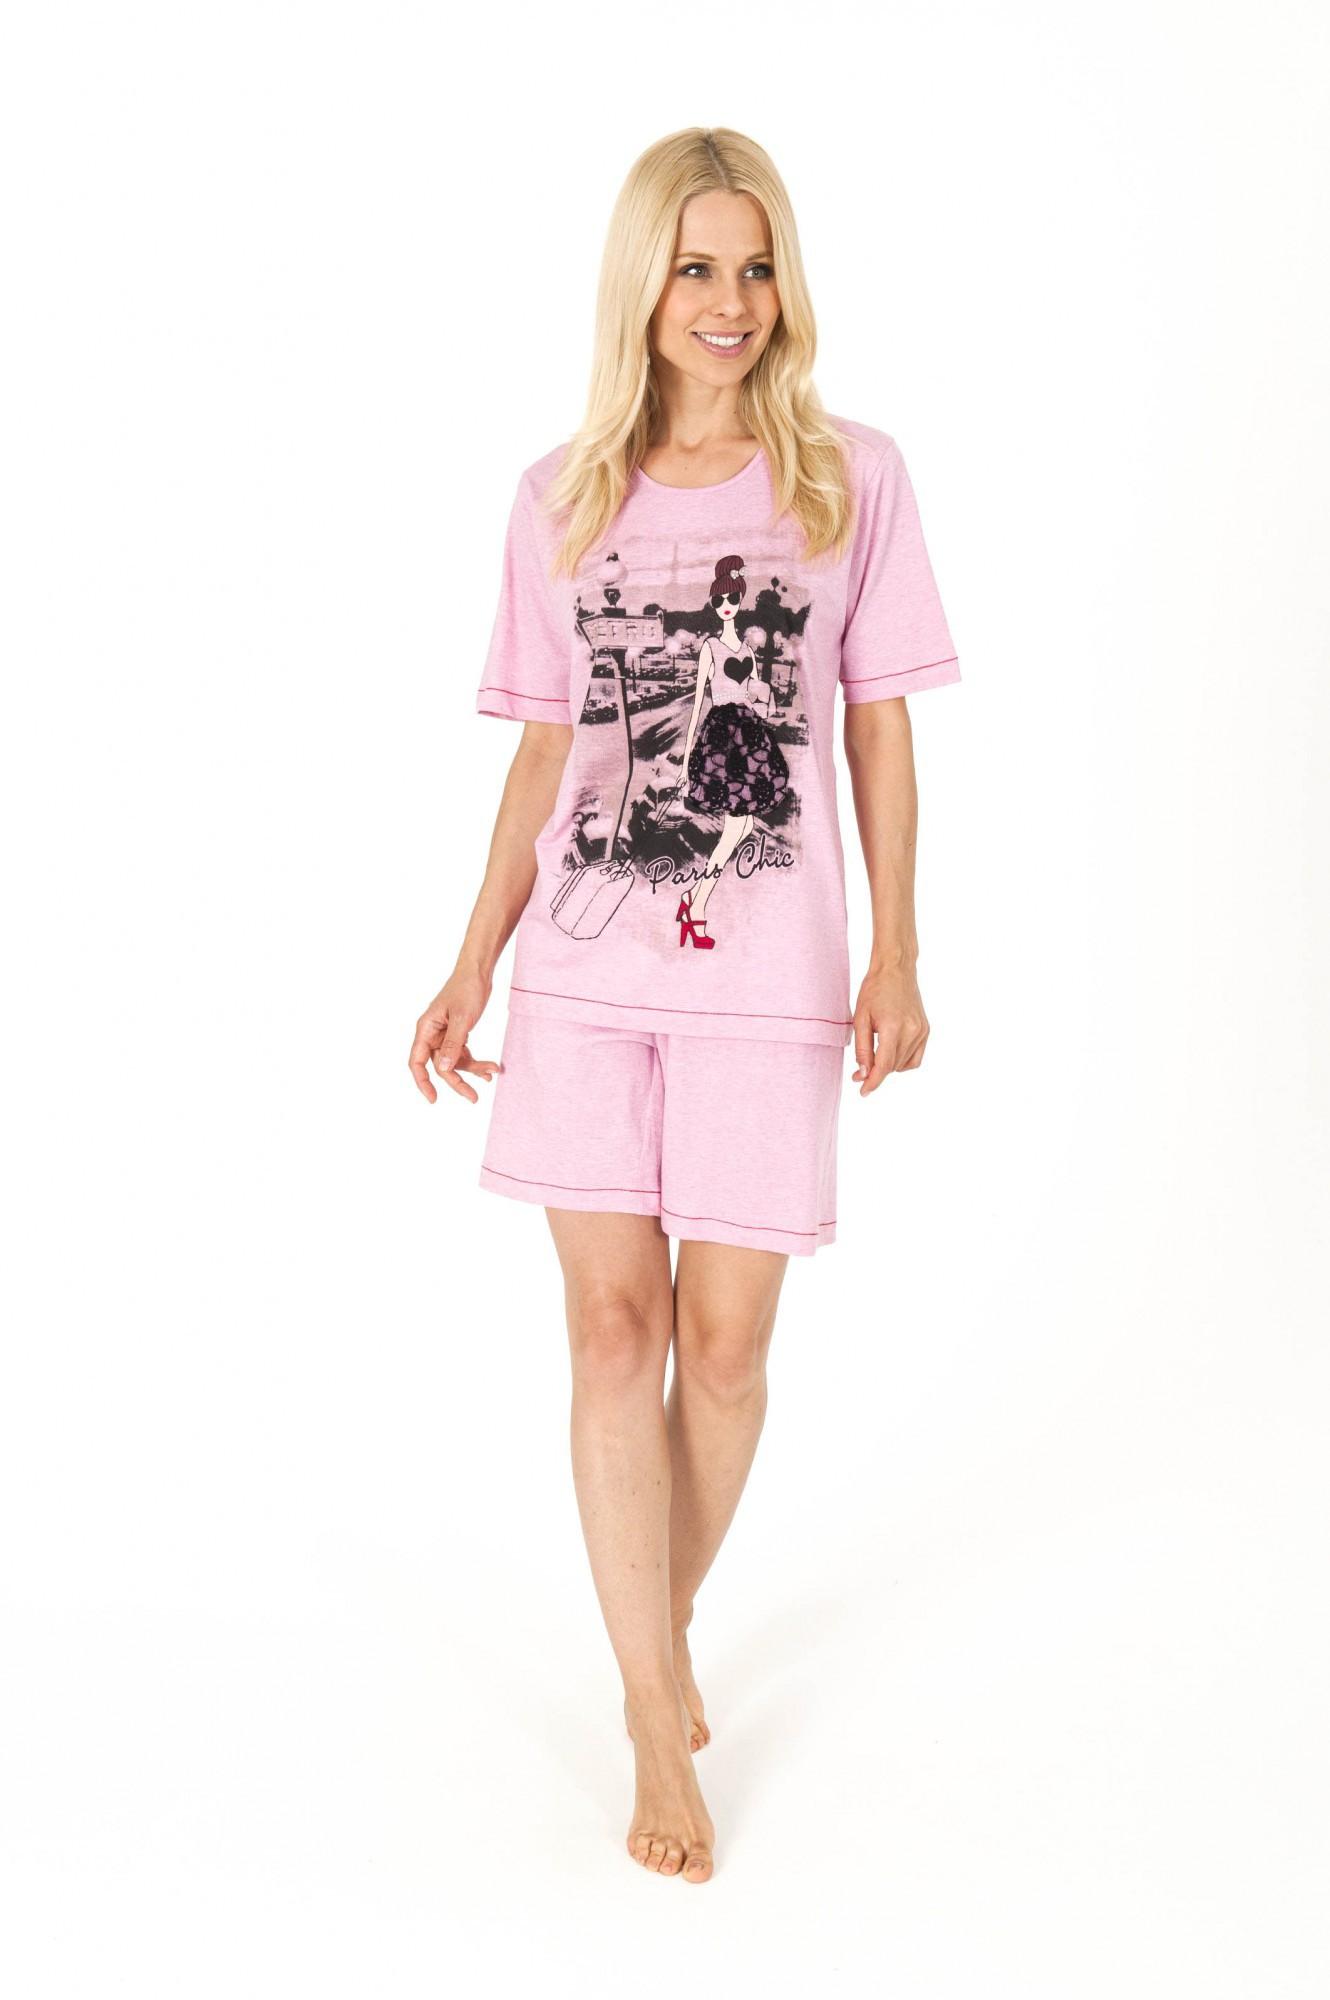 Zauberhafter Damen Shorty Pyjama aus 100 % Baumwolle - 58638